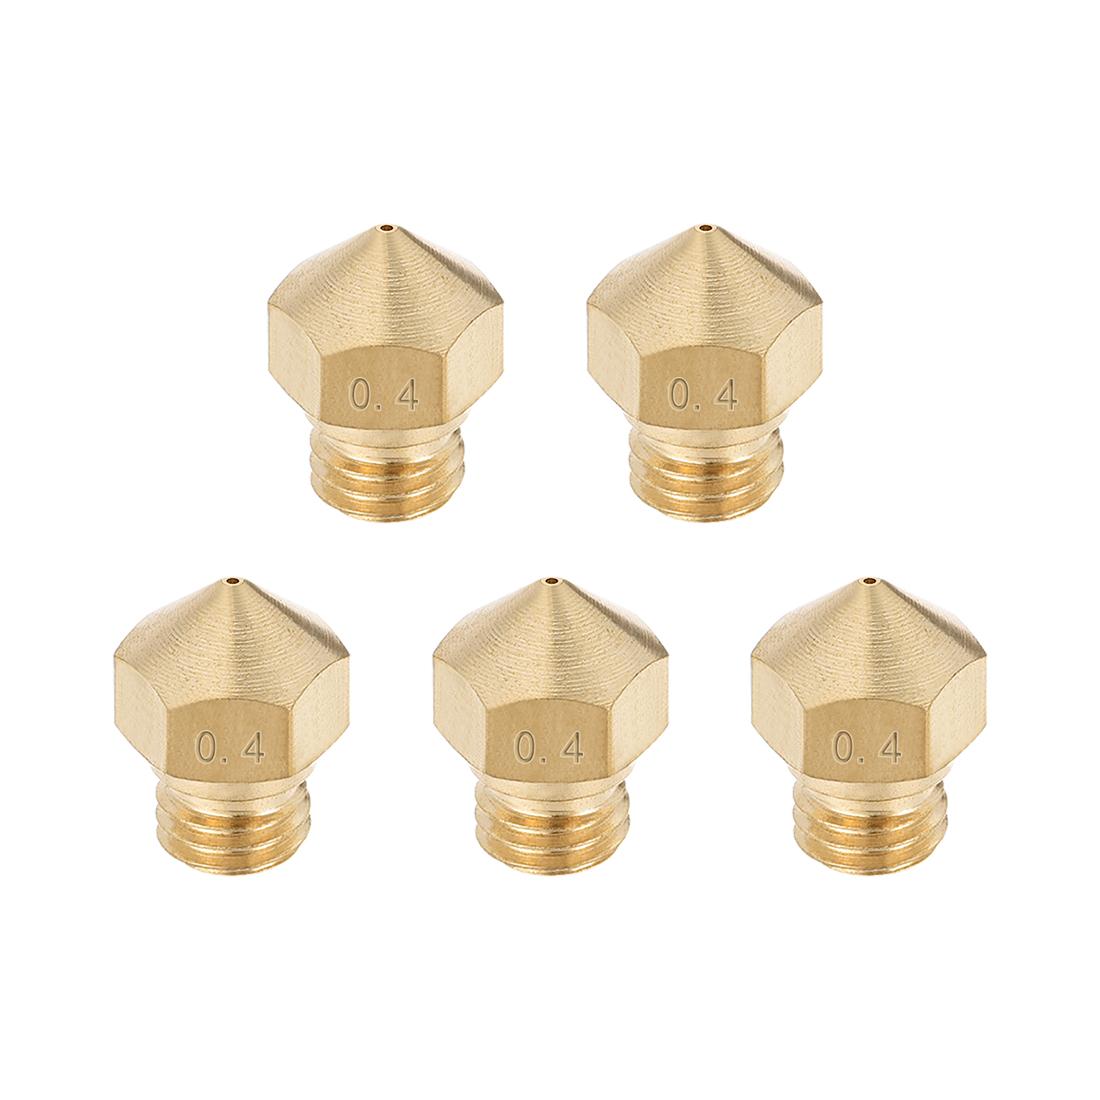 0.4mm 3D Printer Nozzle, Fit for MK10, for 1.75mm Filament Brass 5pcs